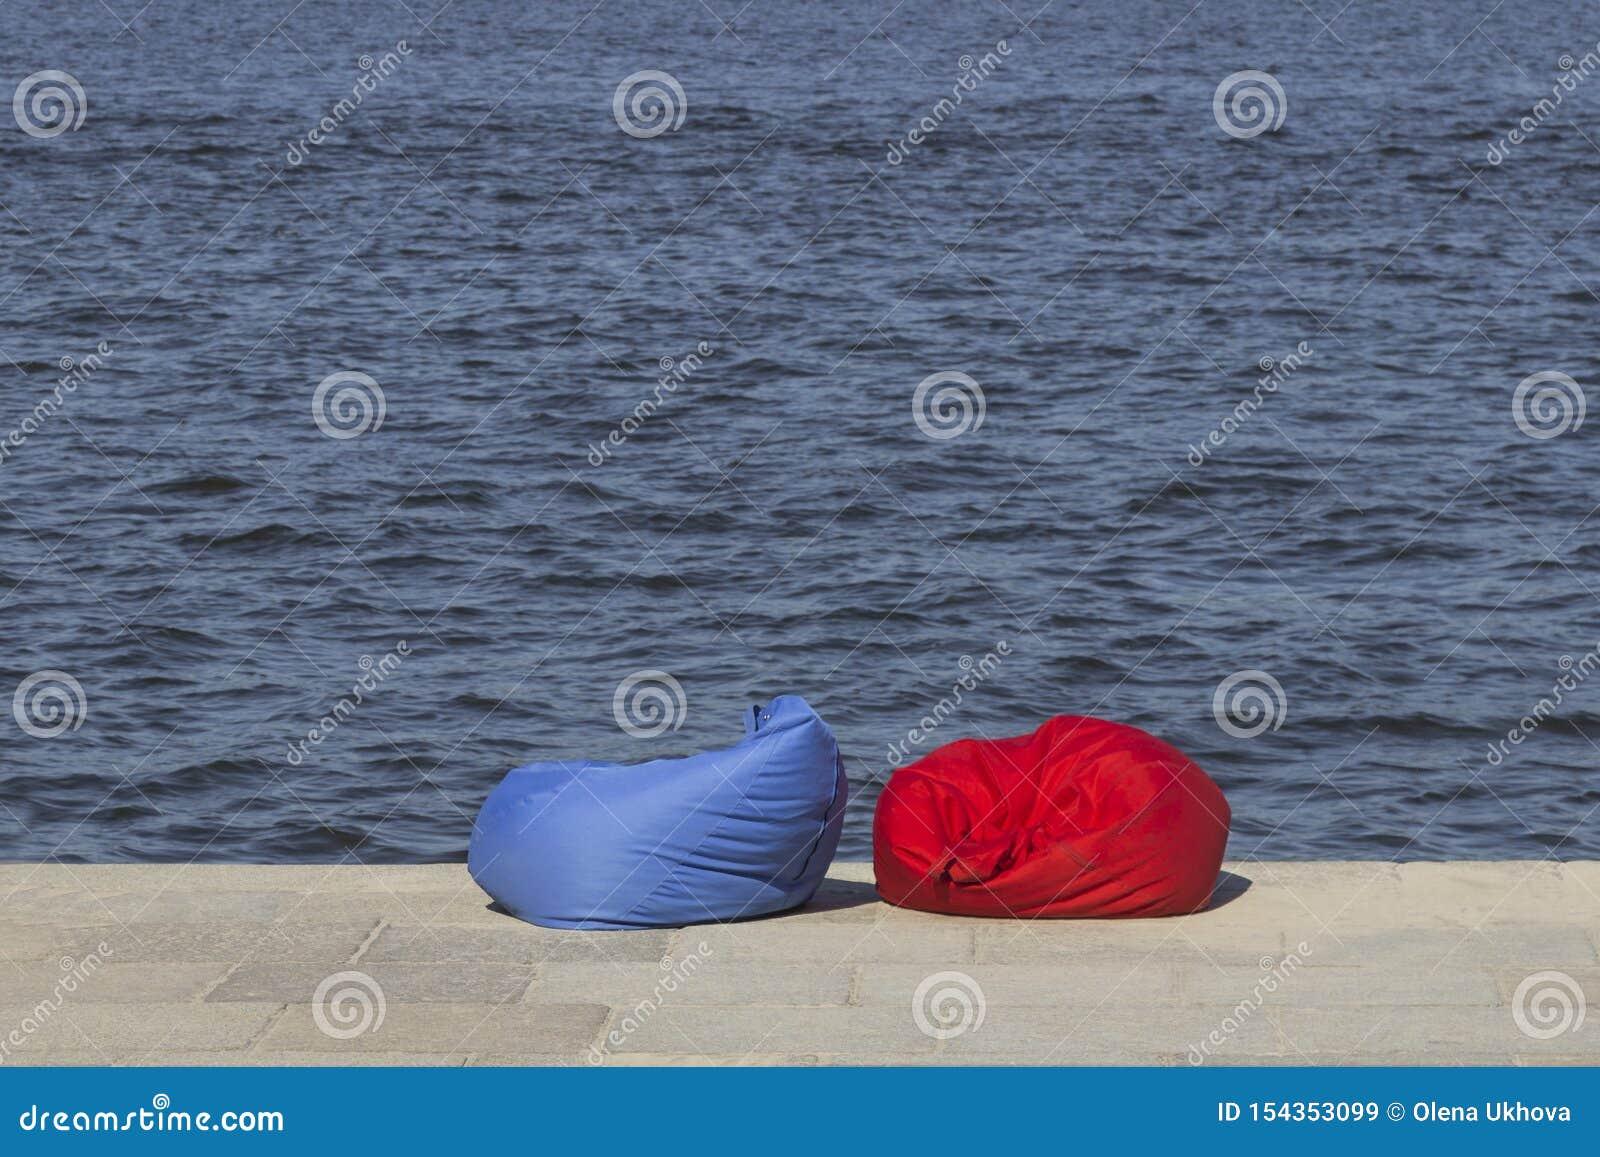 Rood en blauw strandkinderspel op de rivierbank Rust streek